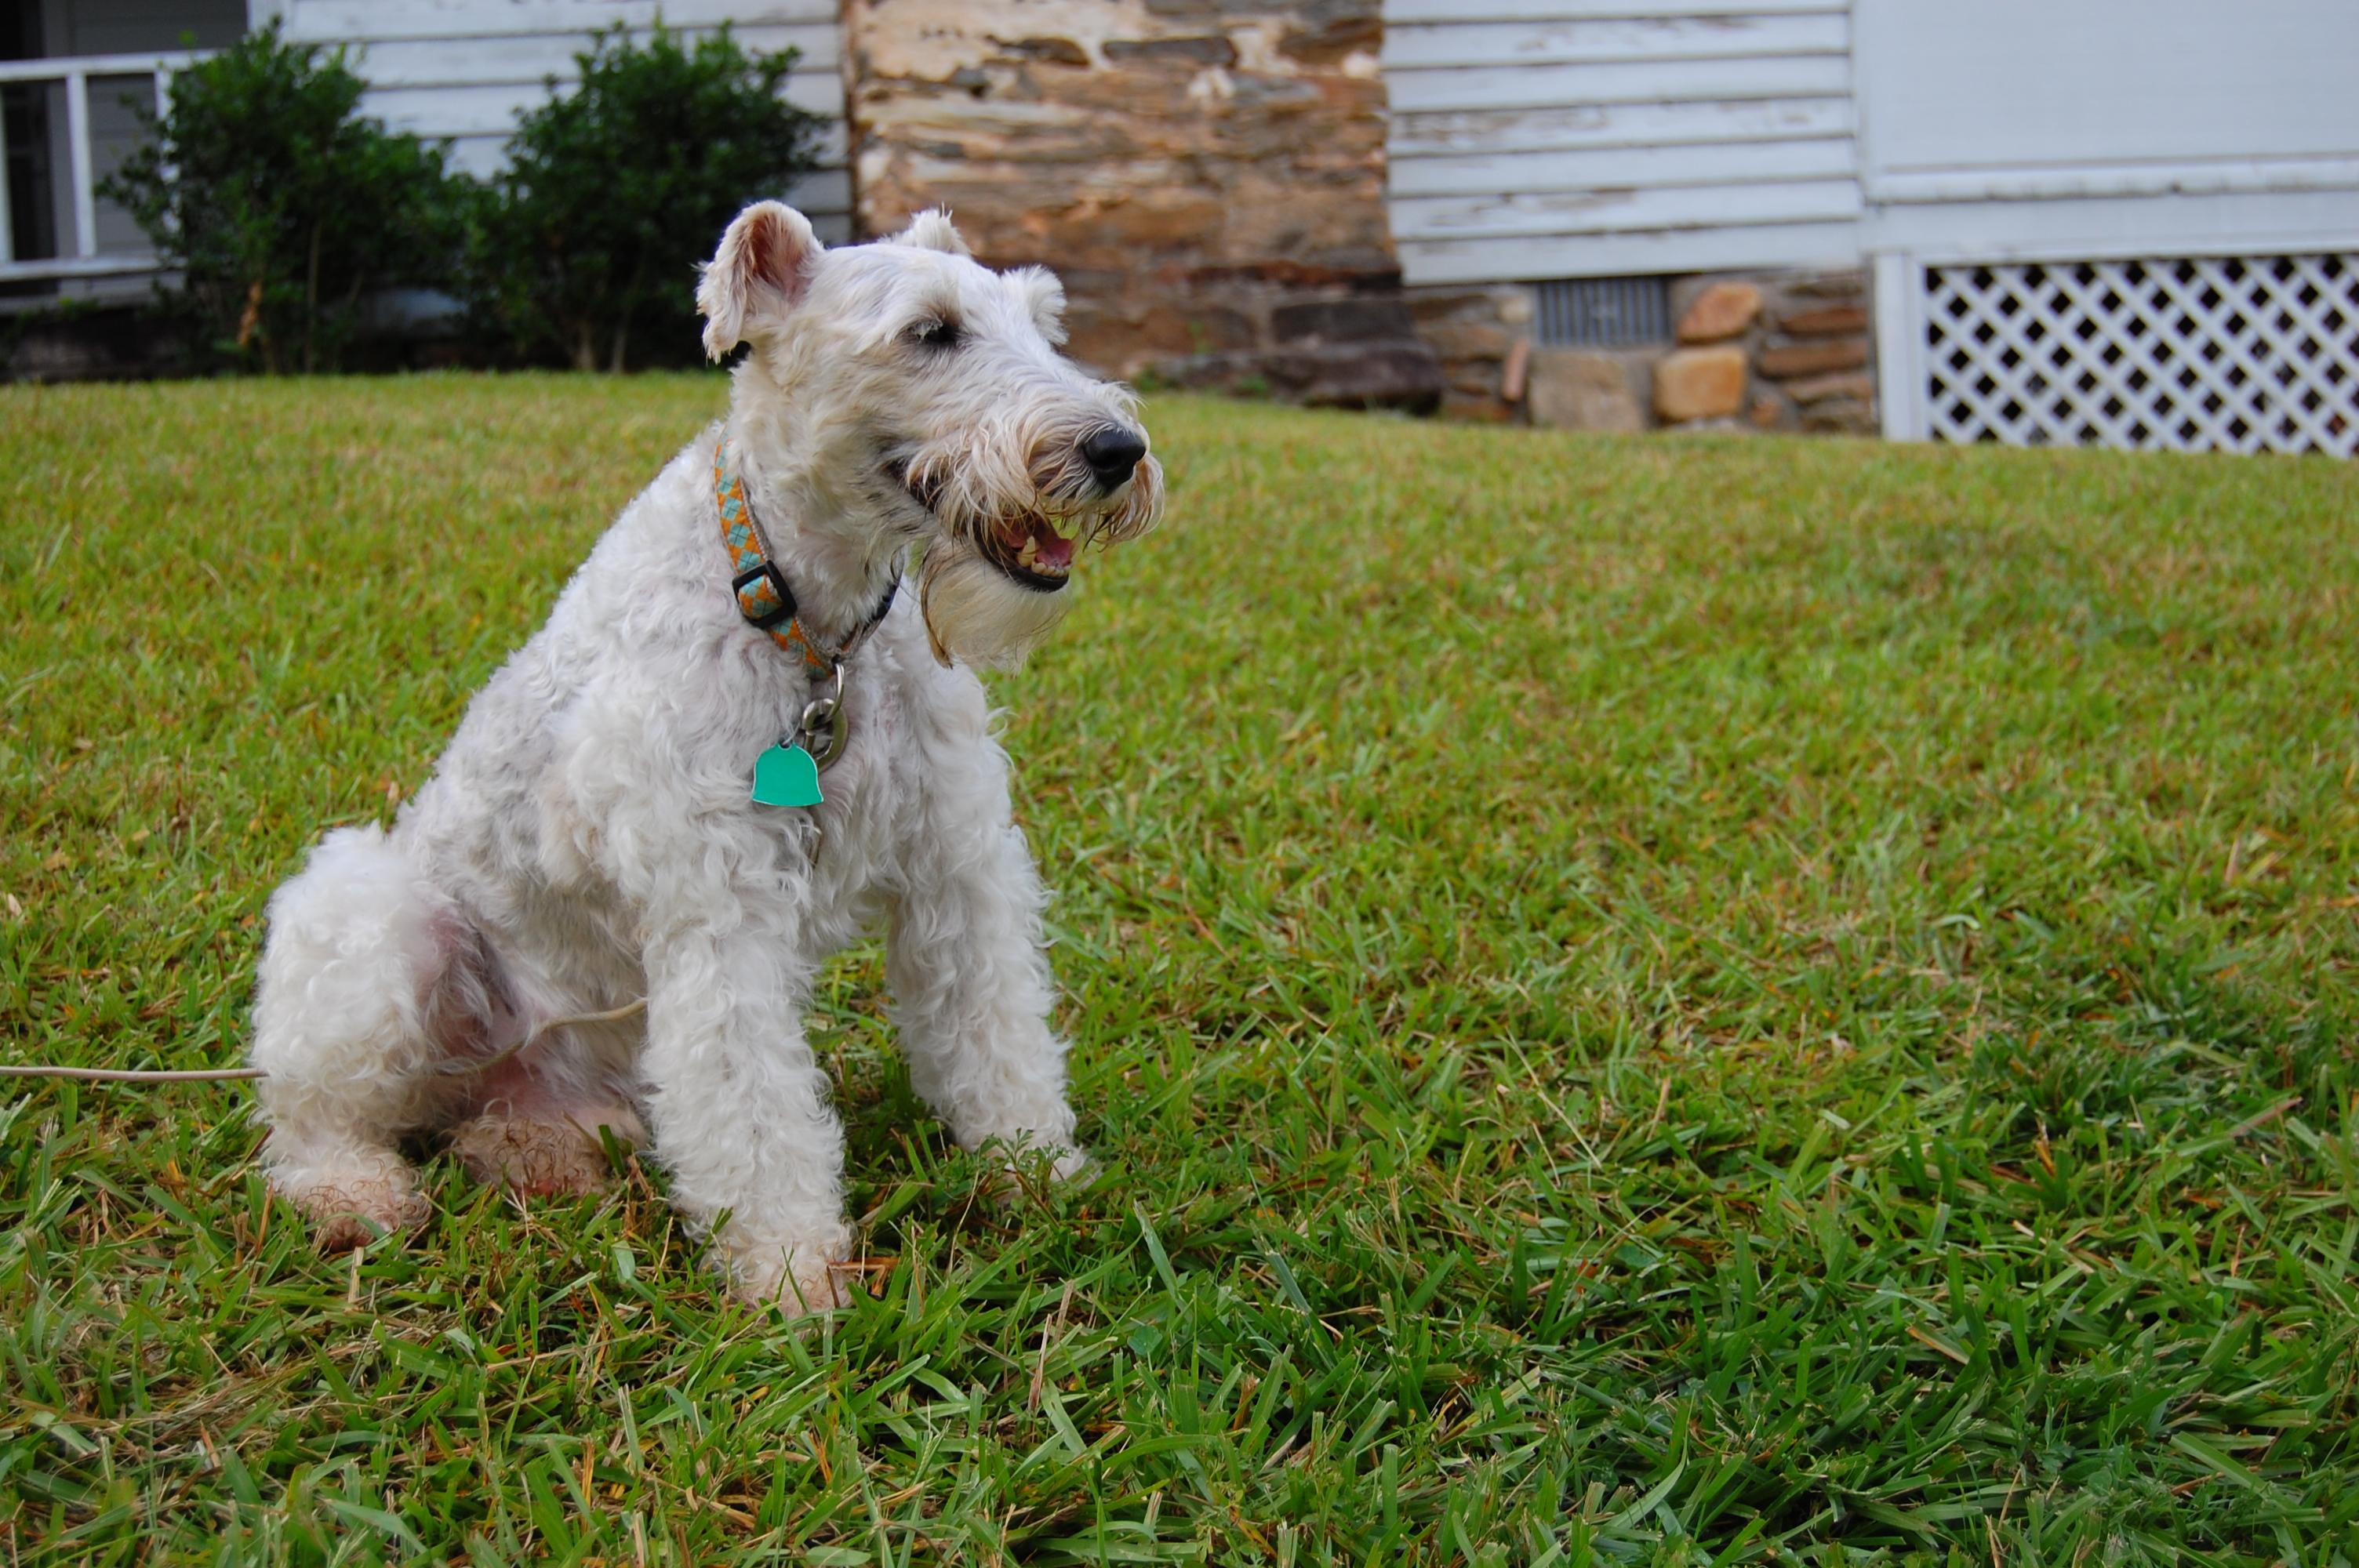 http://upload.wikimedia.org/wikipedia/commons/f/fd/Wire_Fox_Terrier_Sitting.JPG